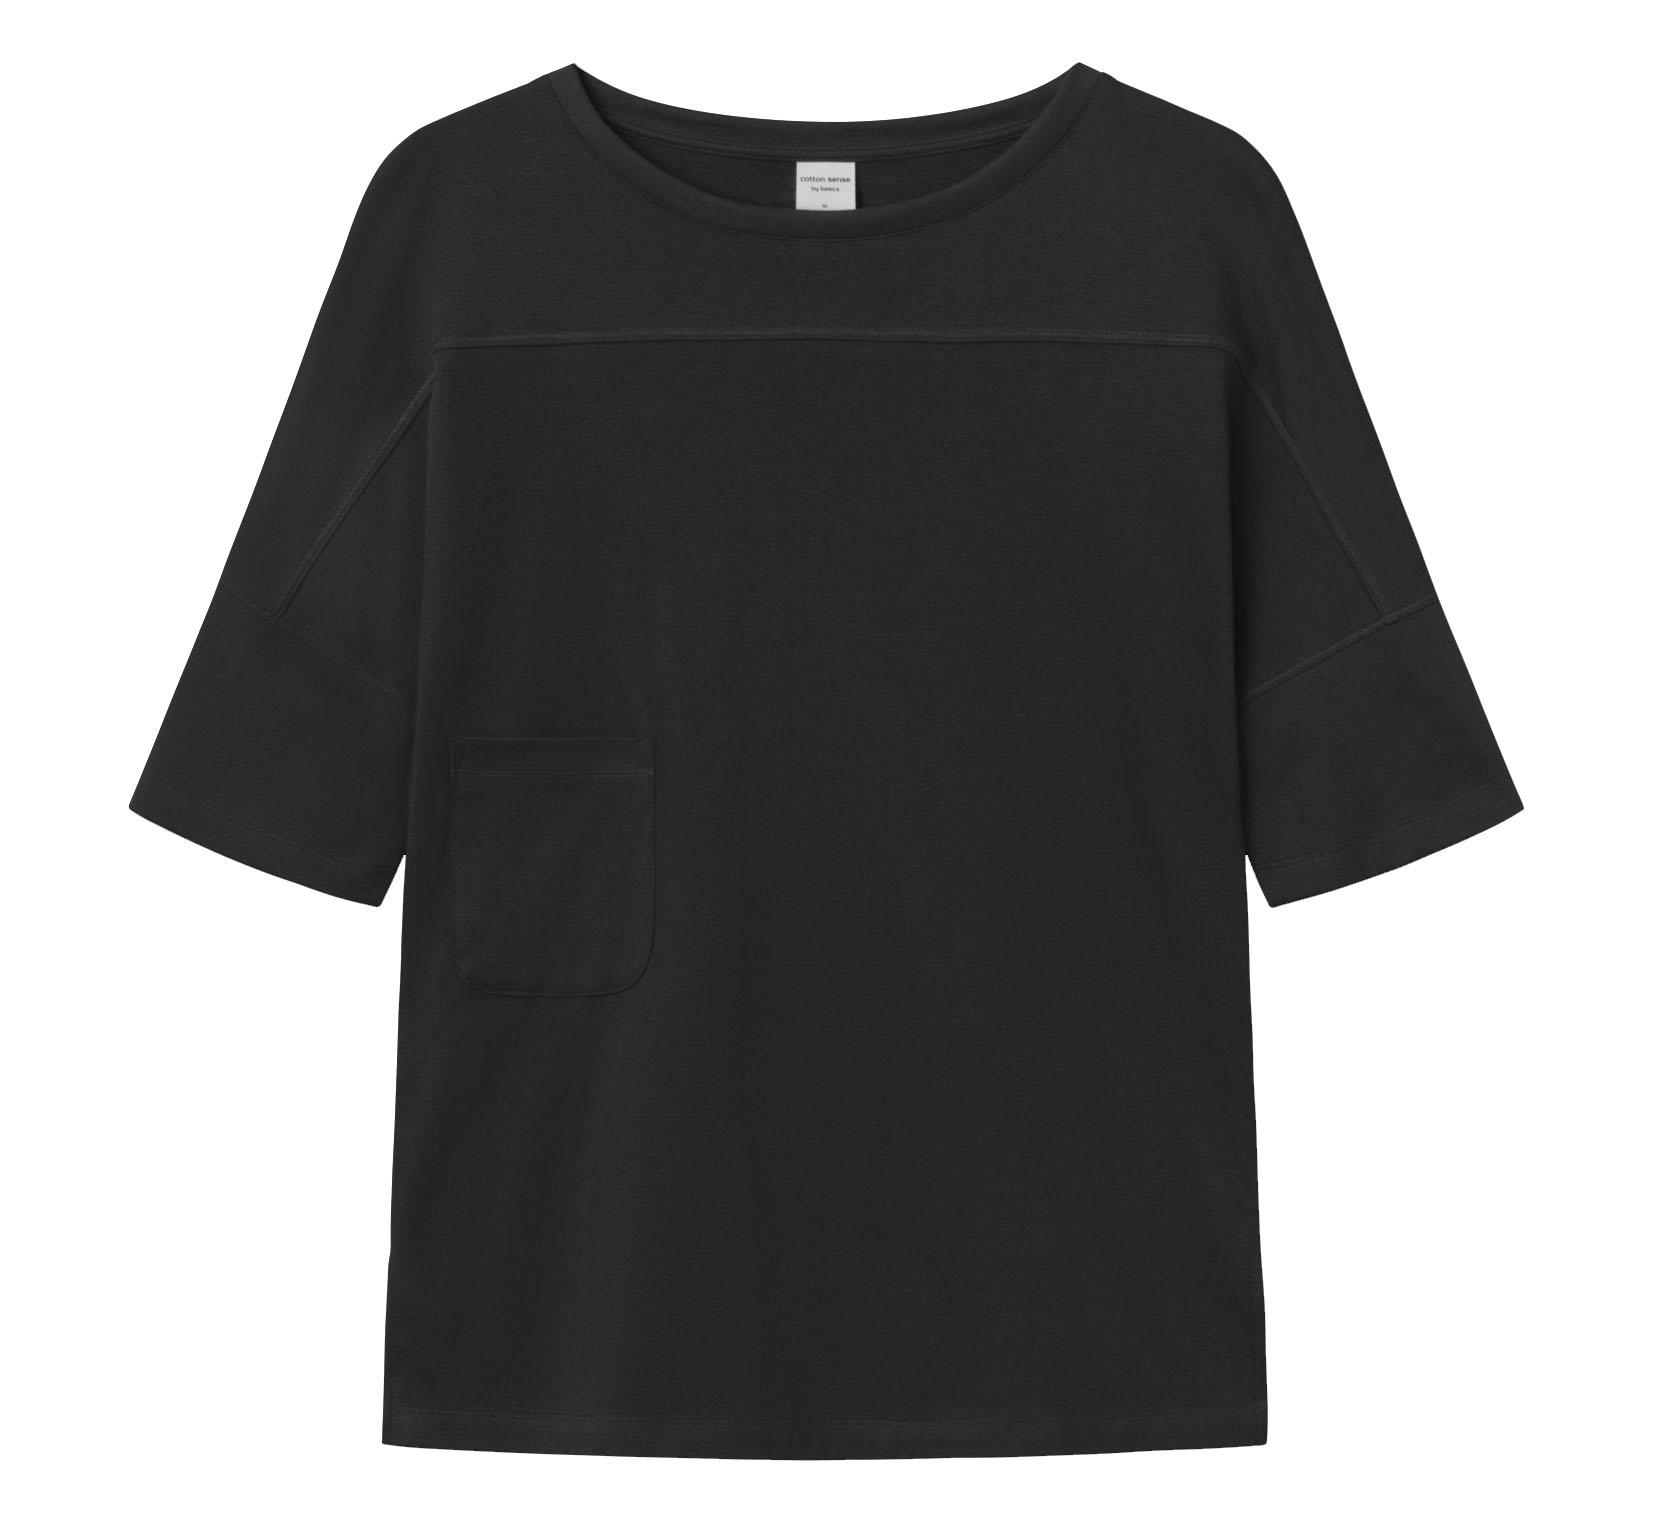 4308 cotton black